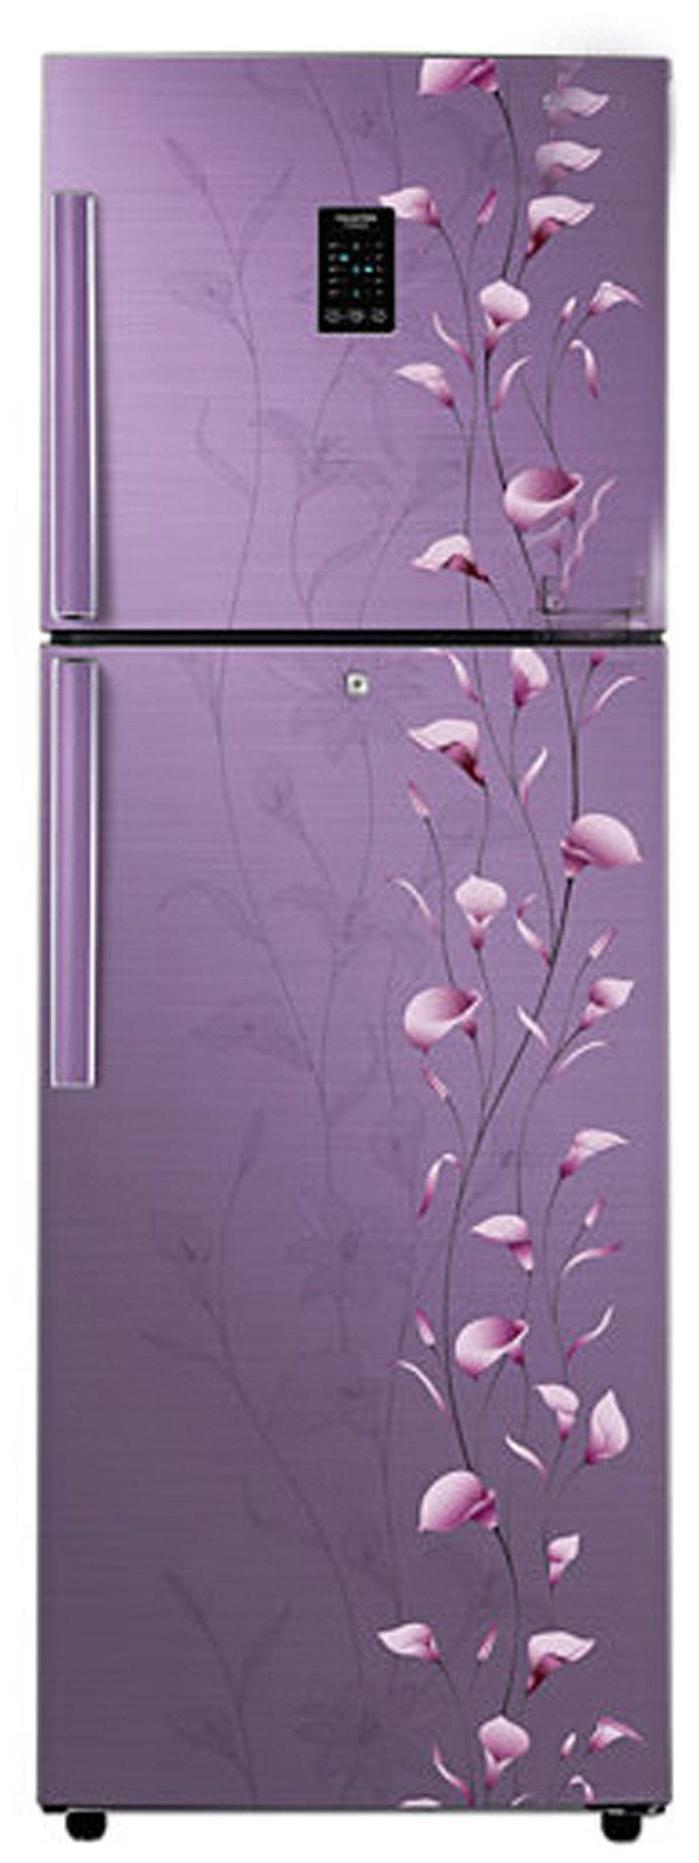 SAMSUNG RT29JSMSAPZ 275Ltr Double Door Refrigerator